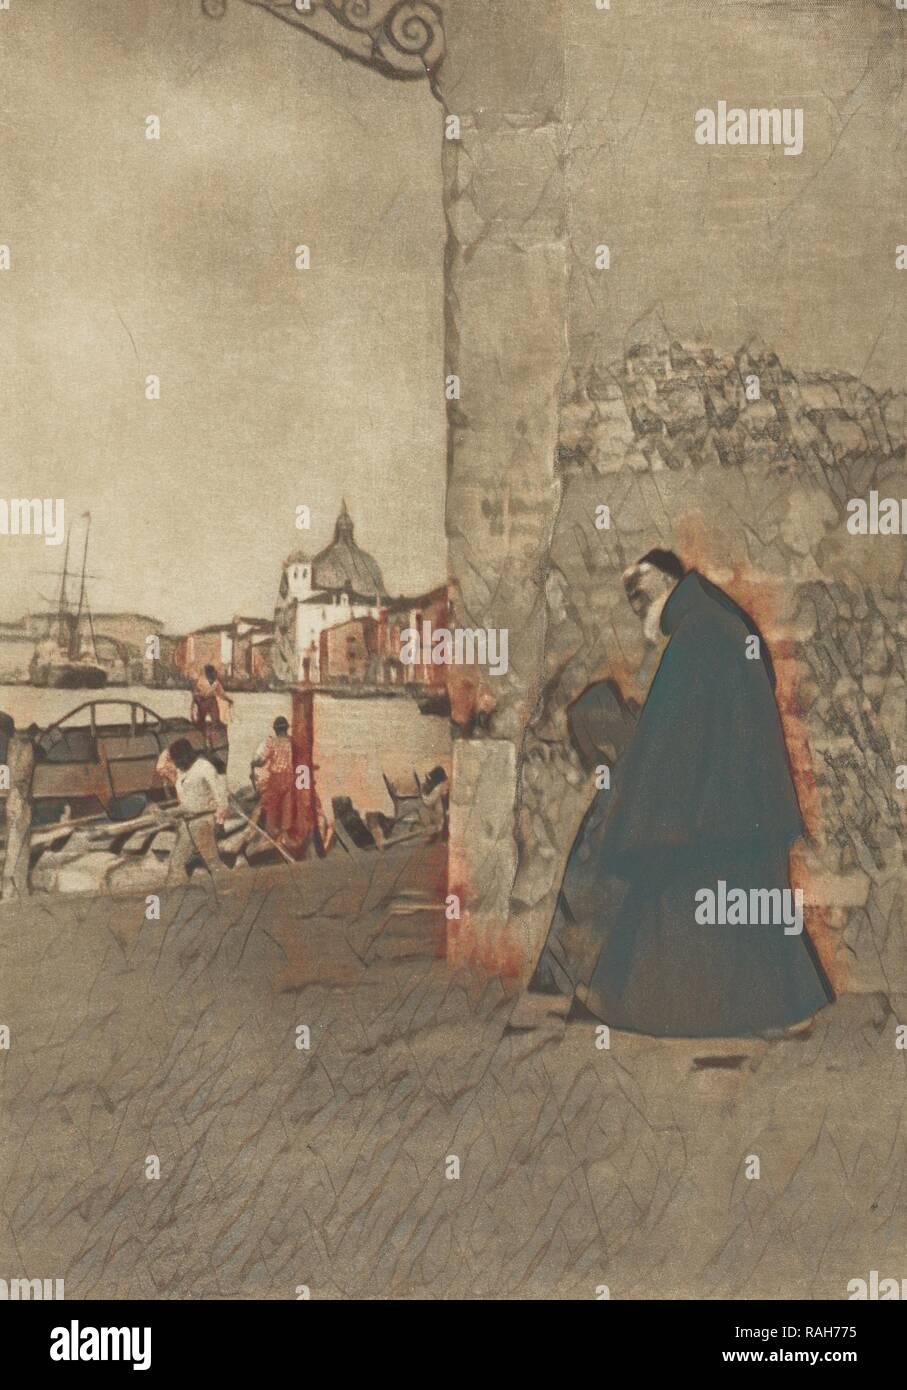 Ein Franziskaner, Venedig, James Craig Annan (Schottische, 1864-1946), Venedig, Italien, Oktober 1904, Photogravüre, 19,7 x 14 Neuerfundene Stockbild